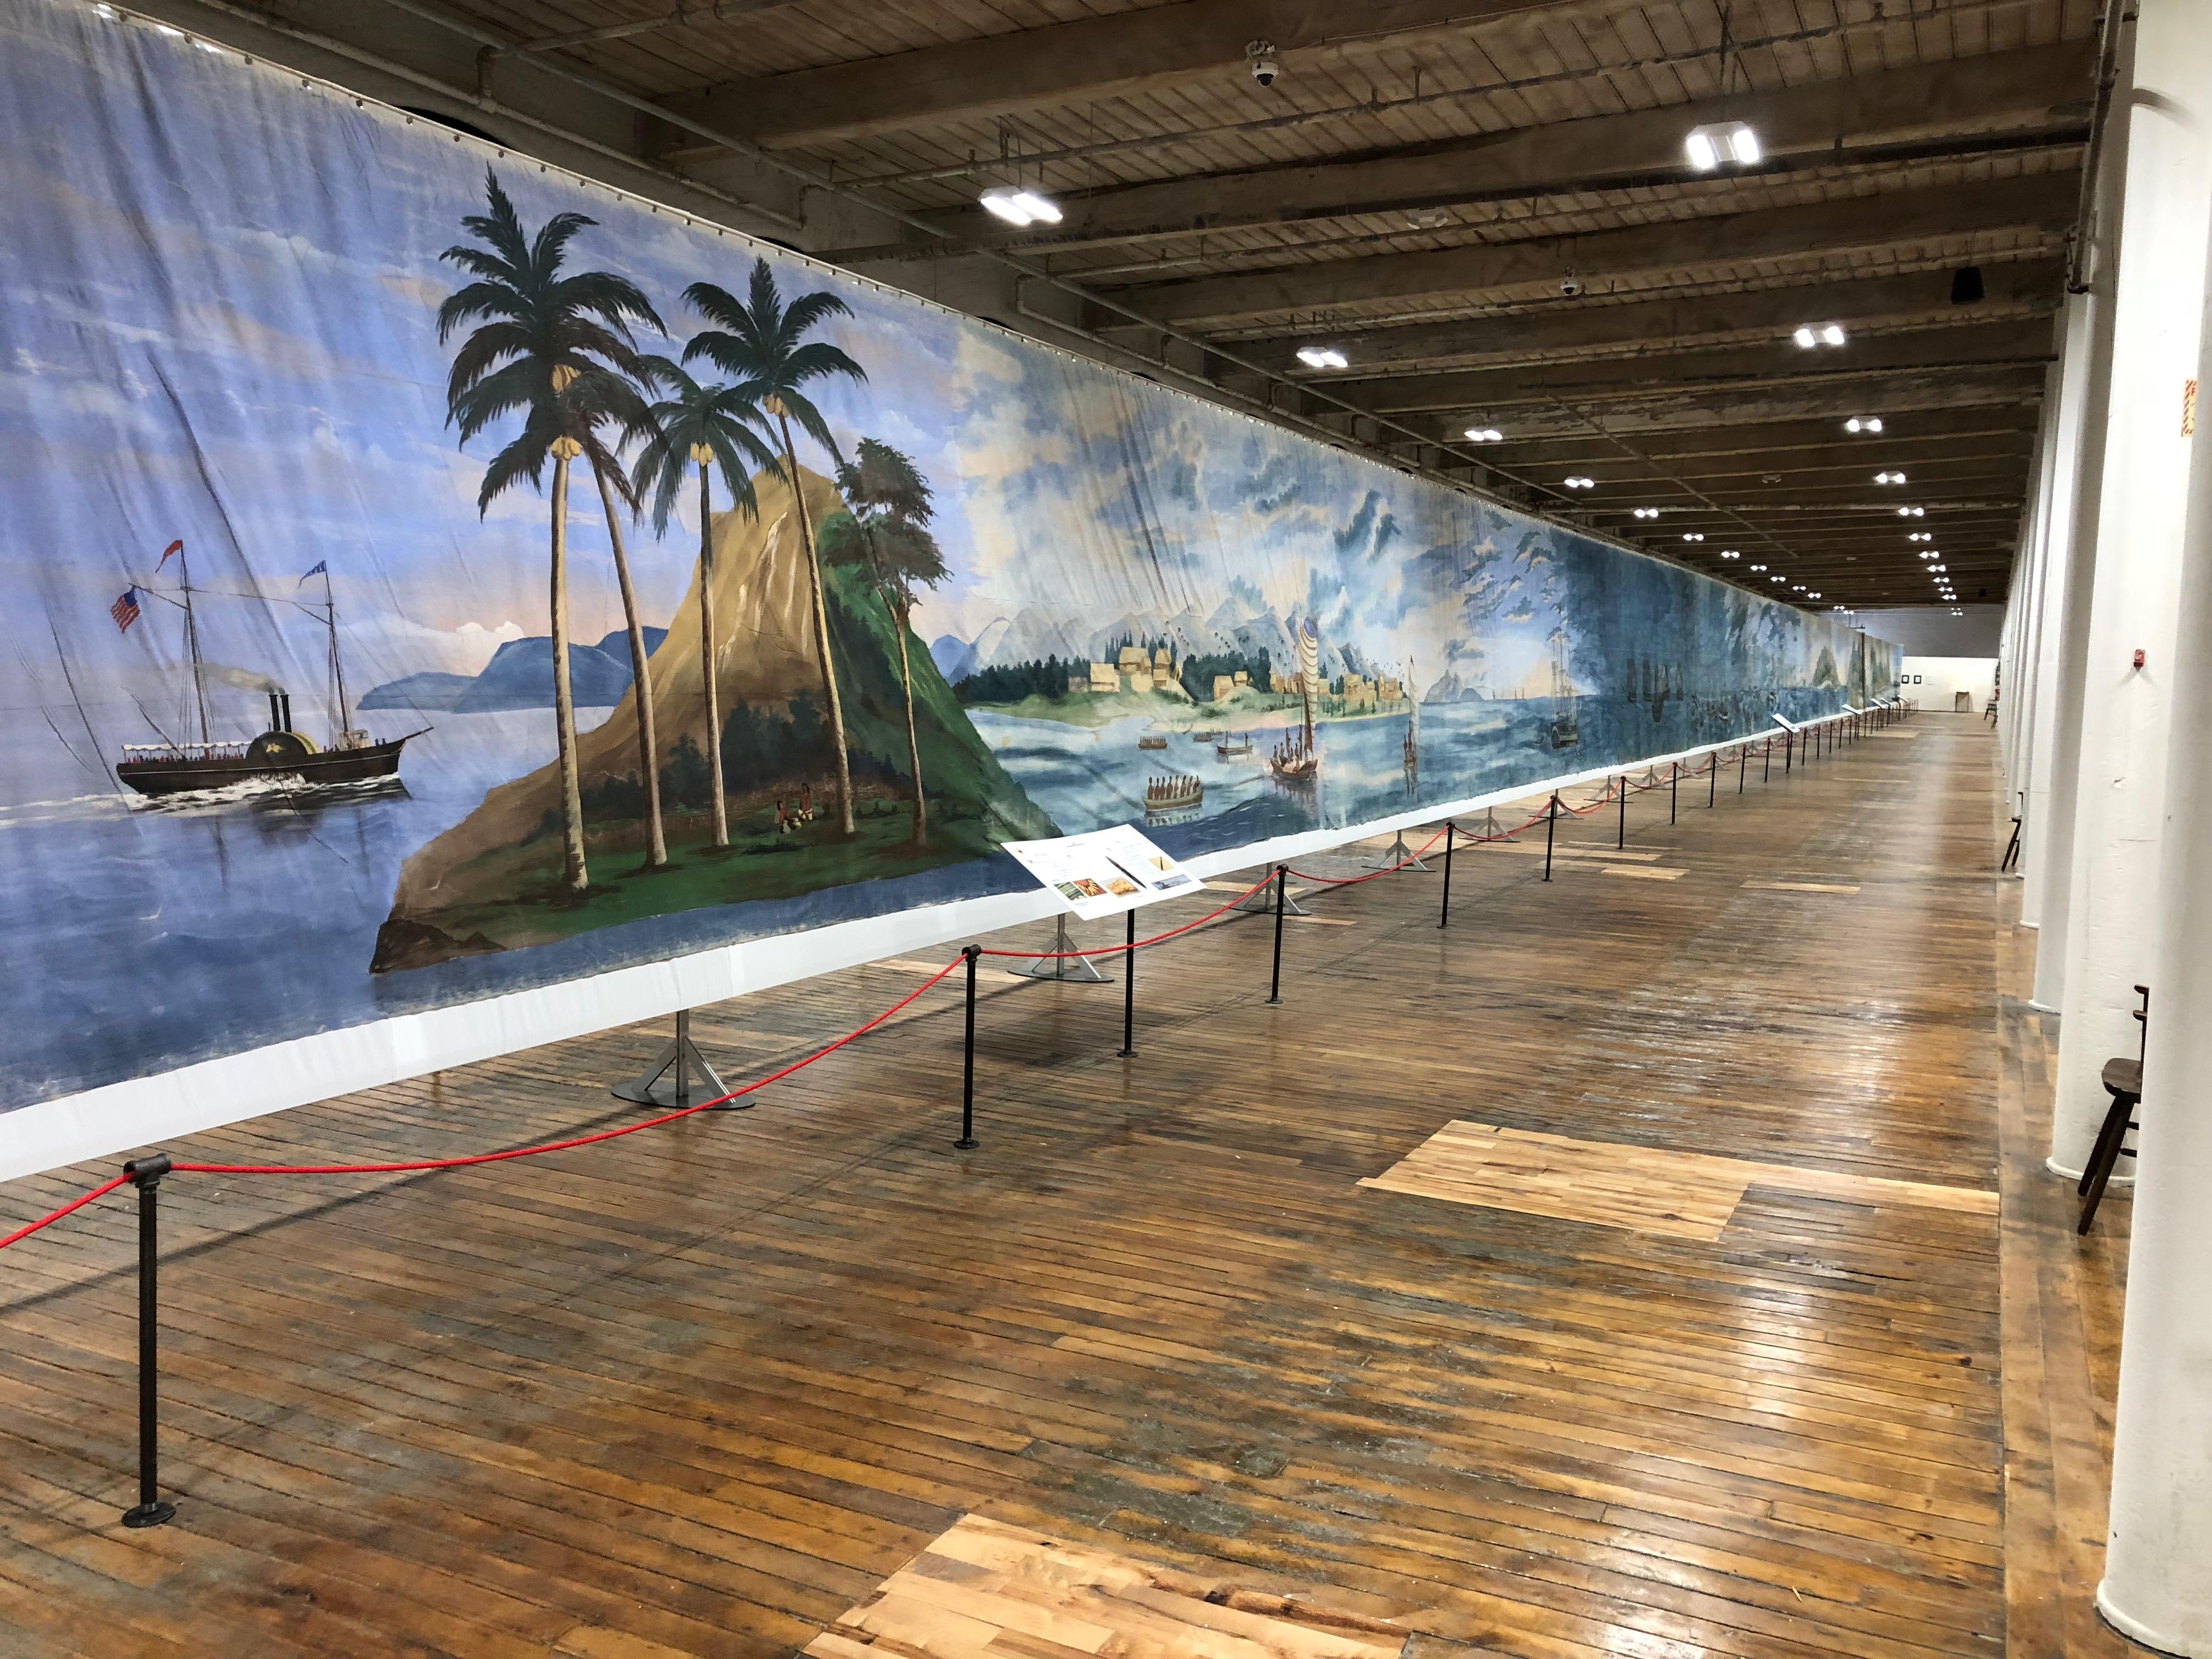 092518-whalers-visit-Fiji